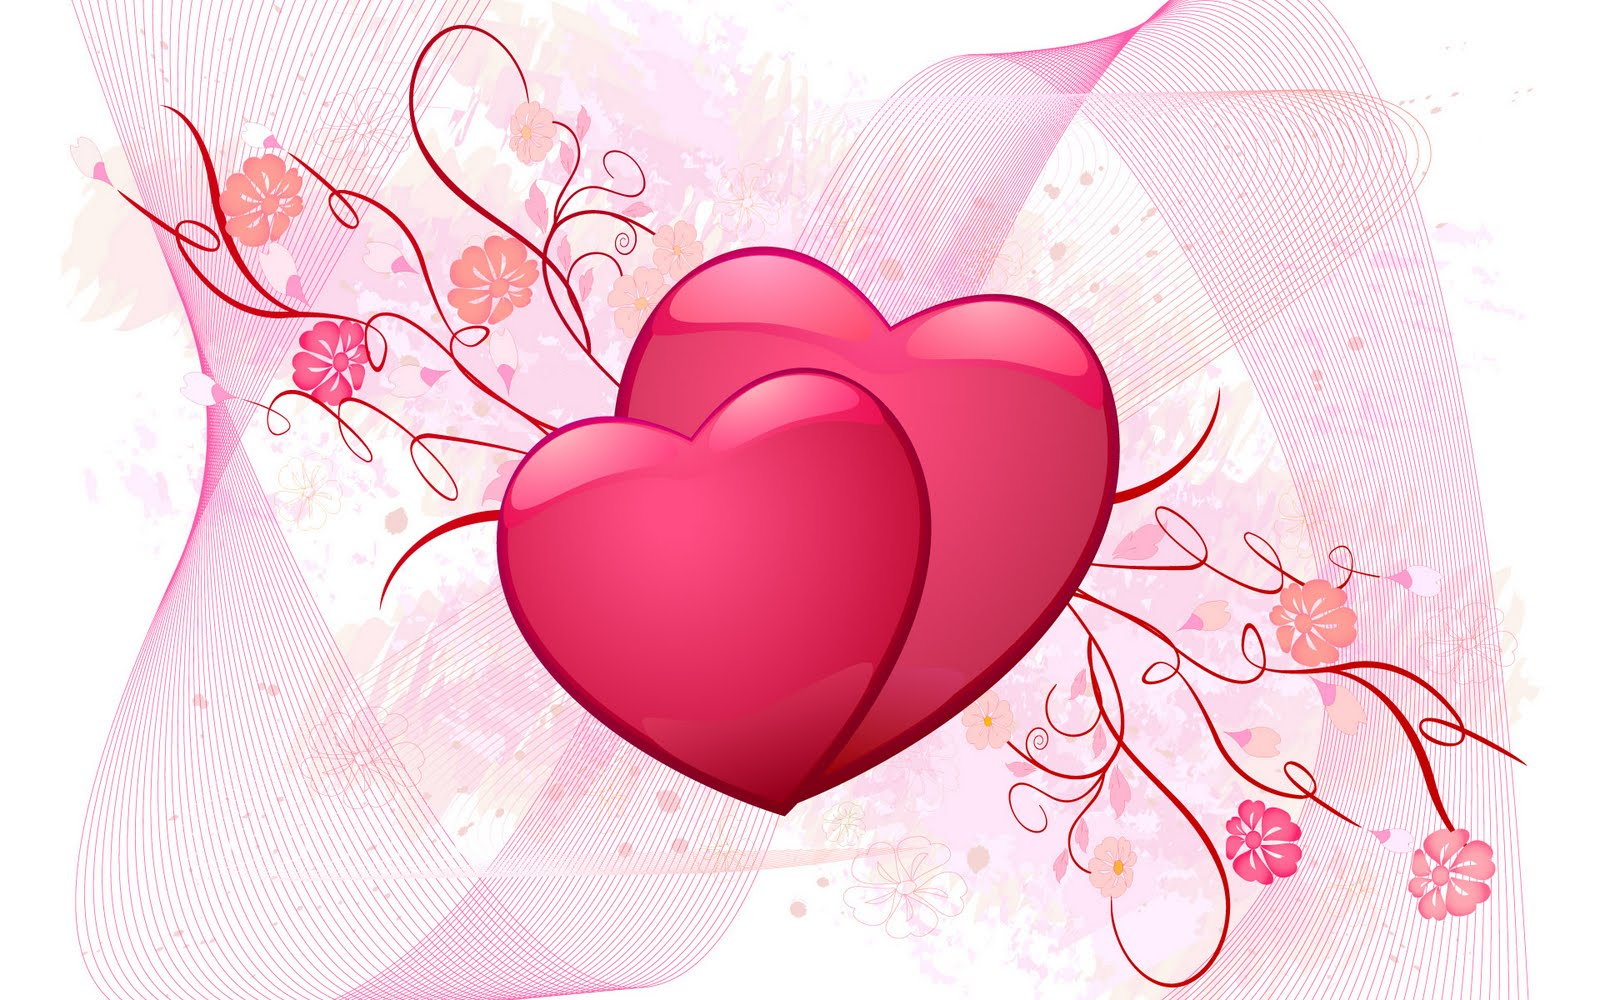 valentines day wallpaper 5Final Fantasy HD Wallpaper 1Salma Hayek 1600x1000